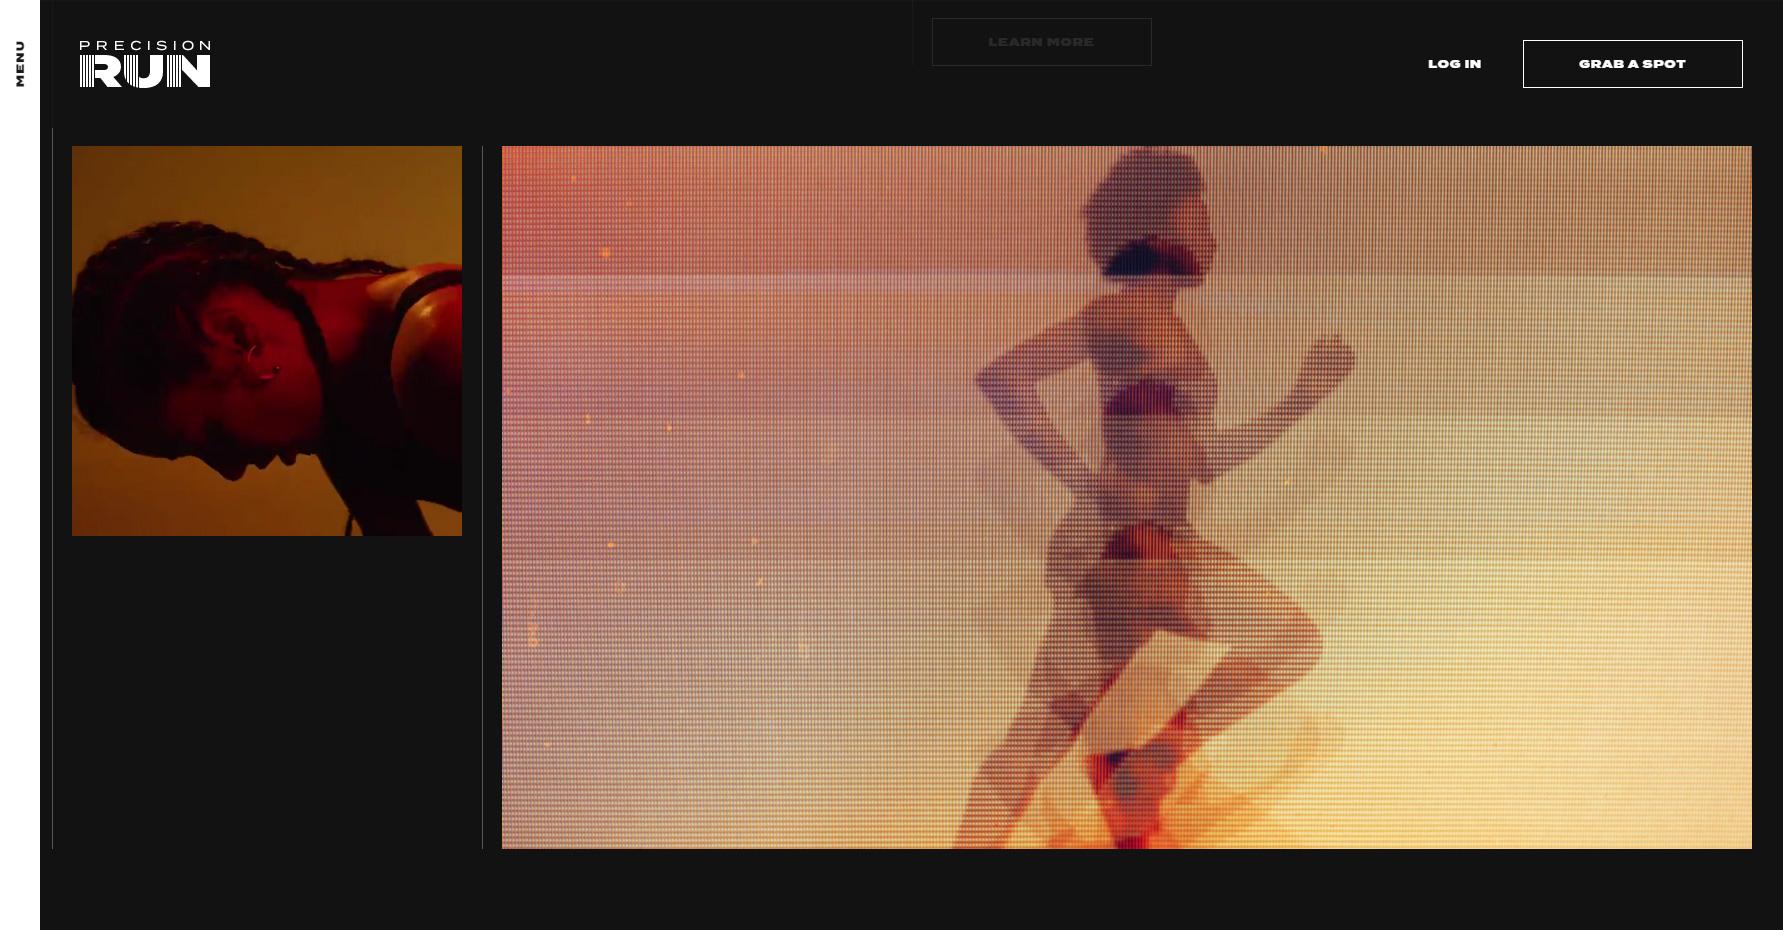 Precision Run - Website of the Day